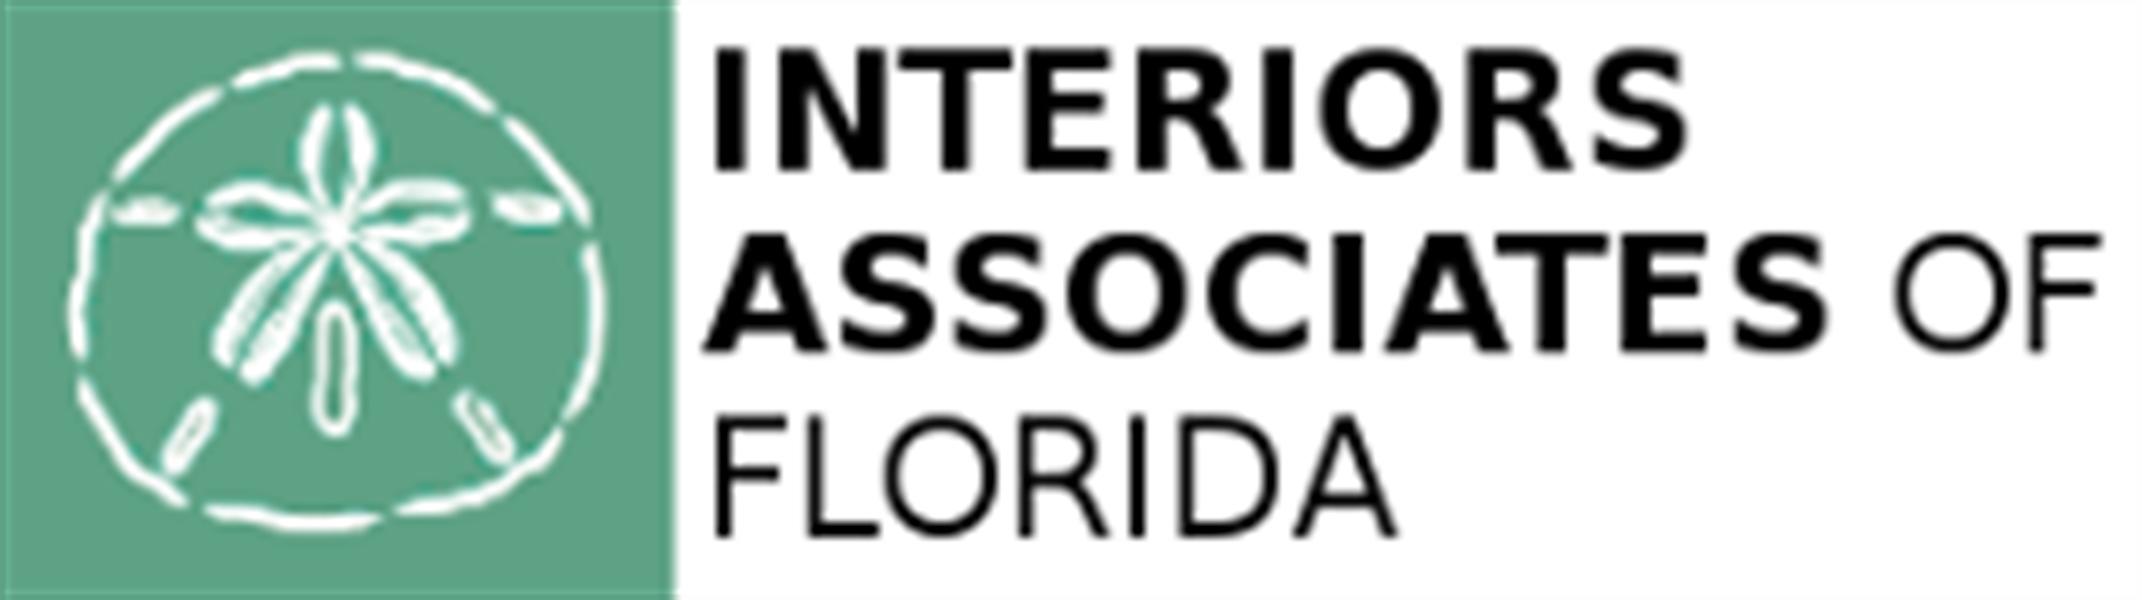 Interiors Associates